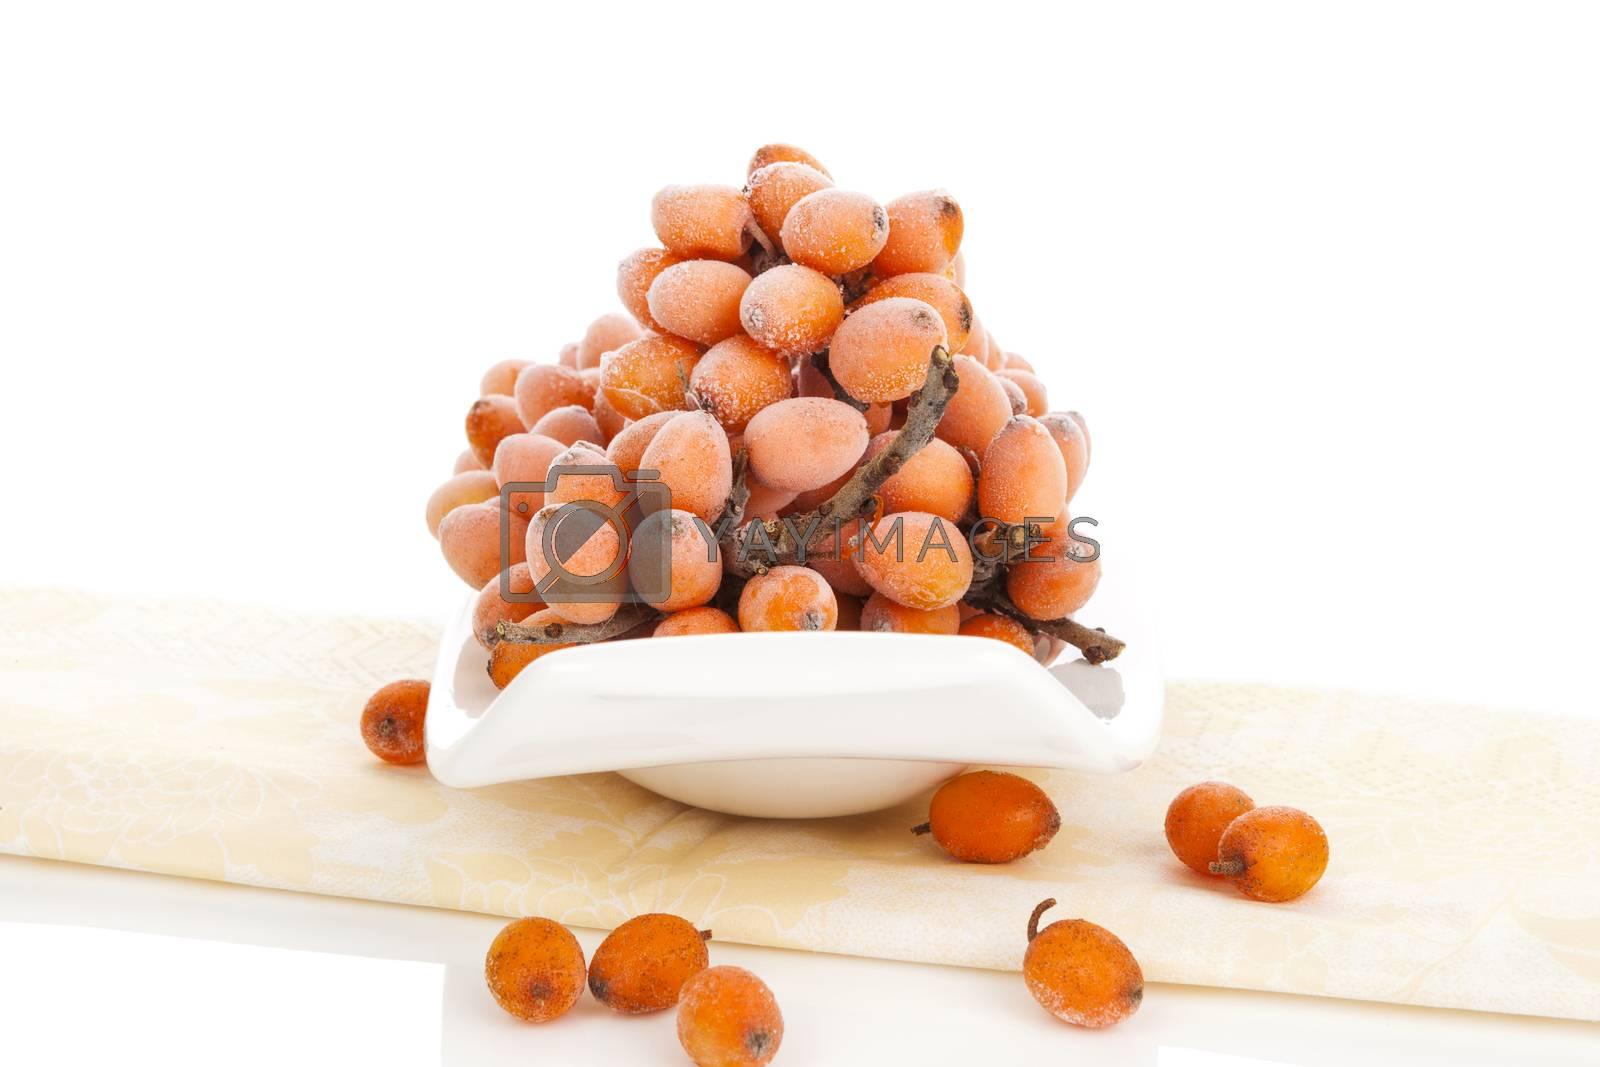 Fresh sea buckthorn berries isolated on white background. Healthy fruit eating, alternative medicine.